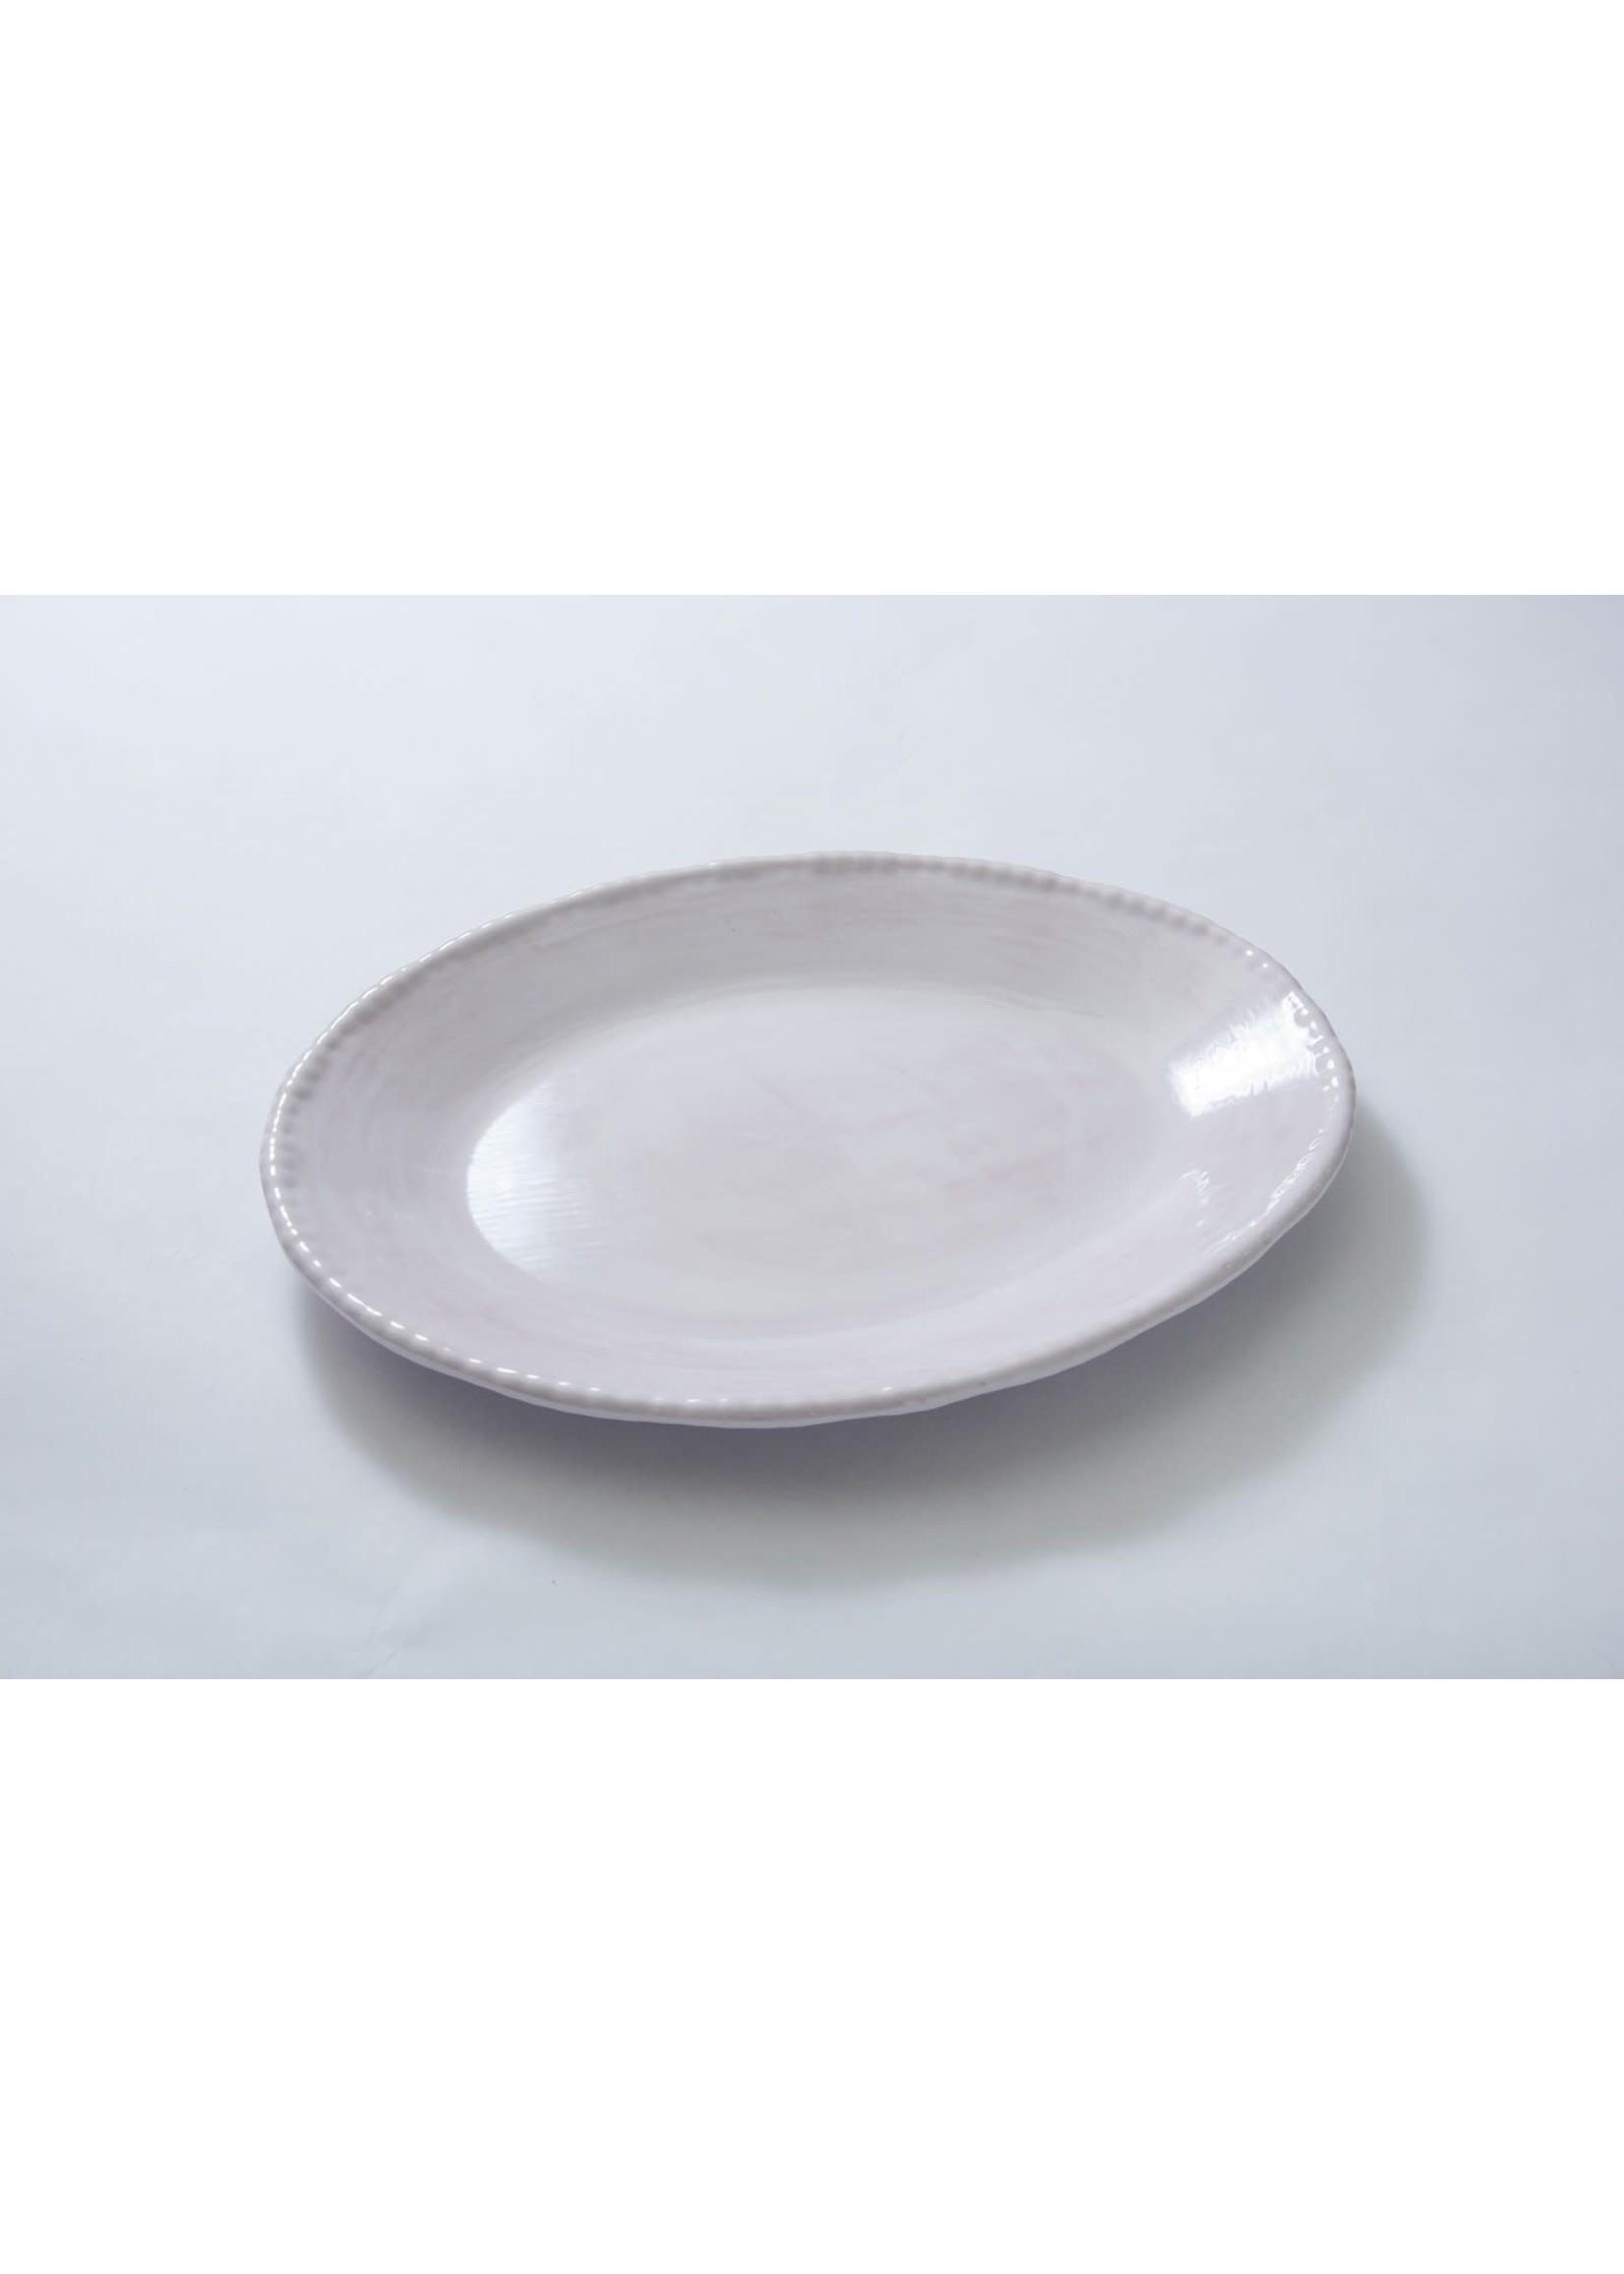 Relish Melamine - Beaded Oval Serving Dish - White